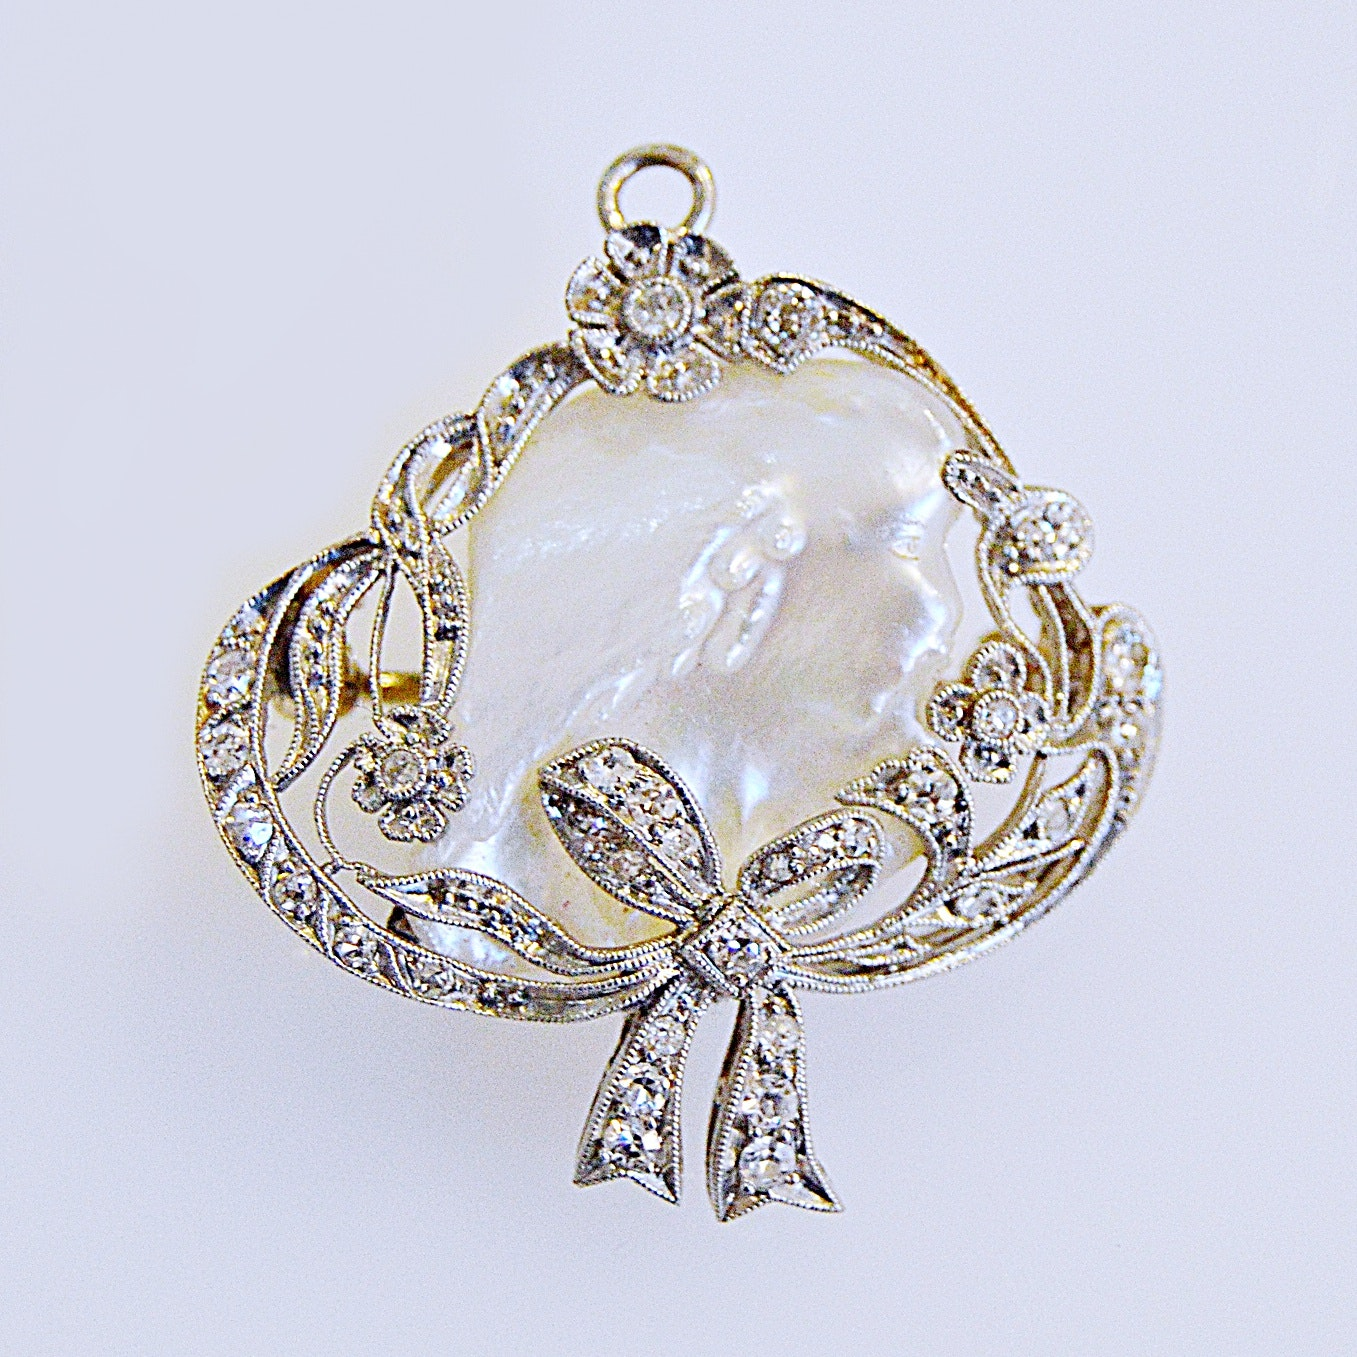 Vintage Platinum, Diamond and Cultured Baroque Pearl Pendant Brooch